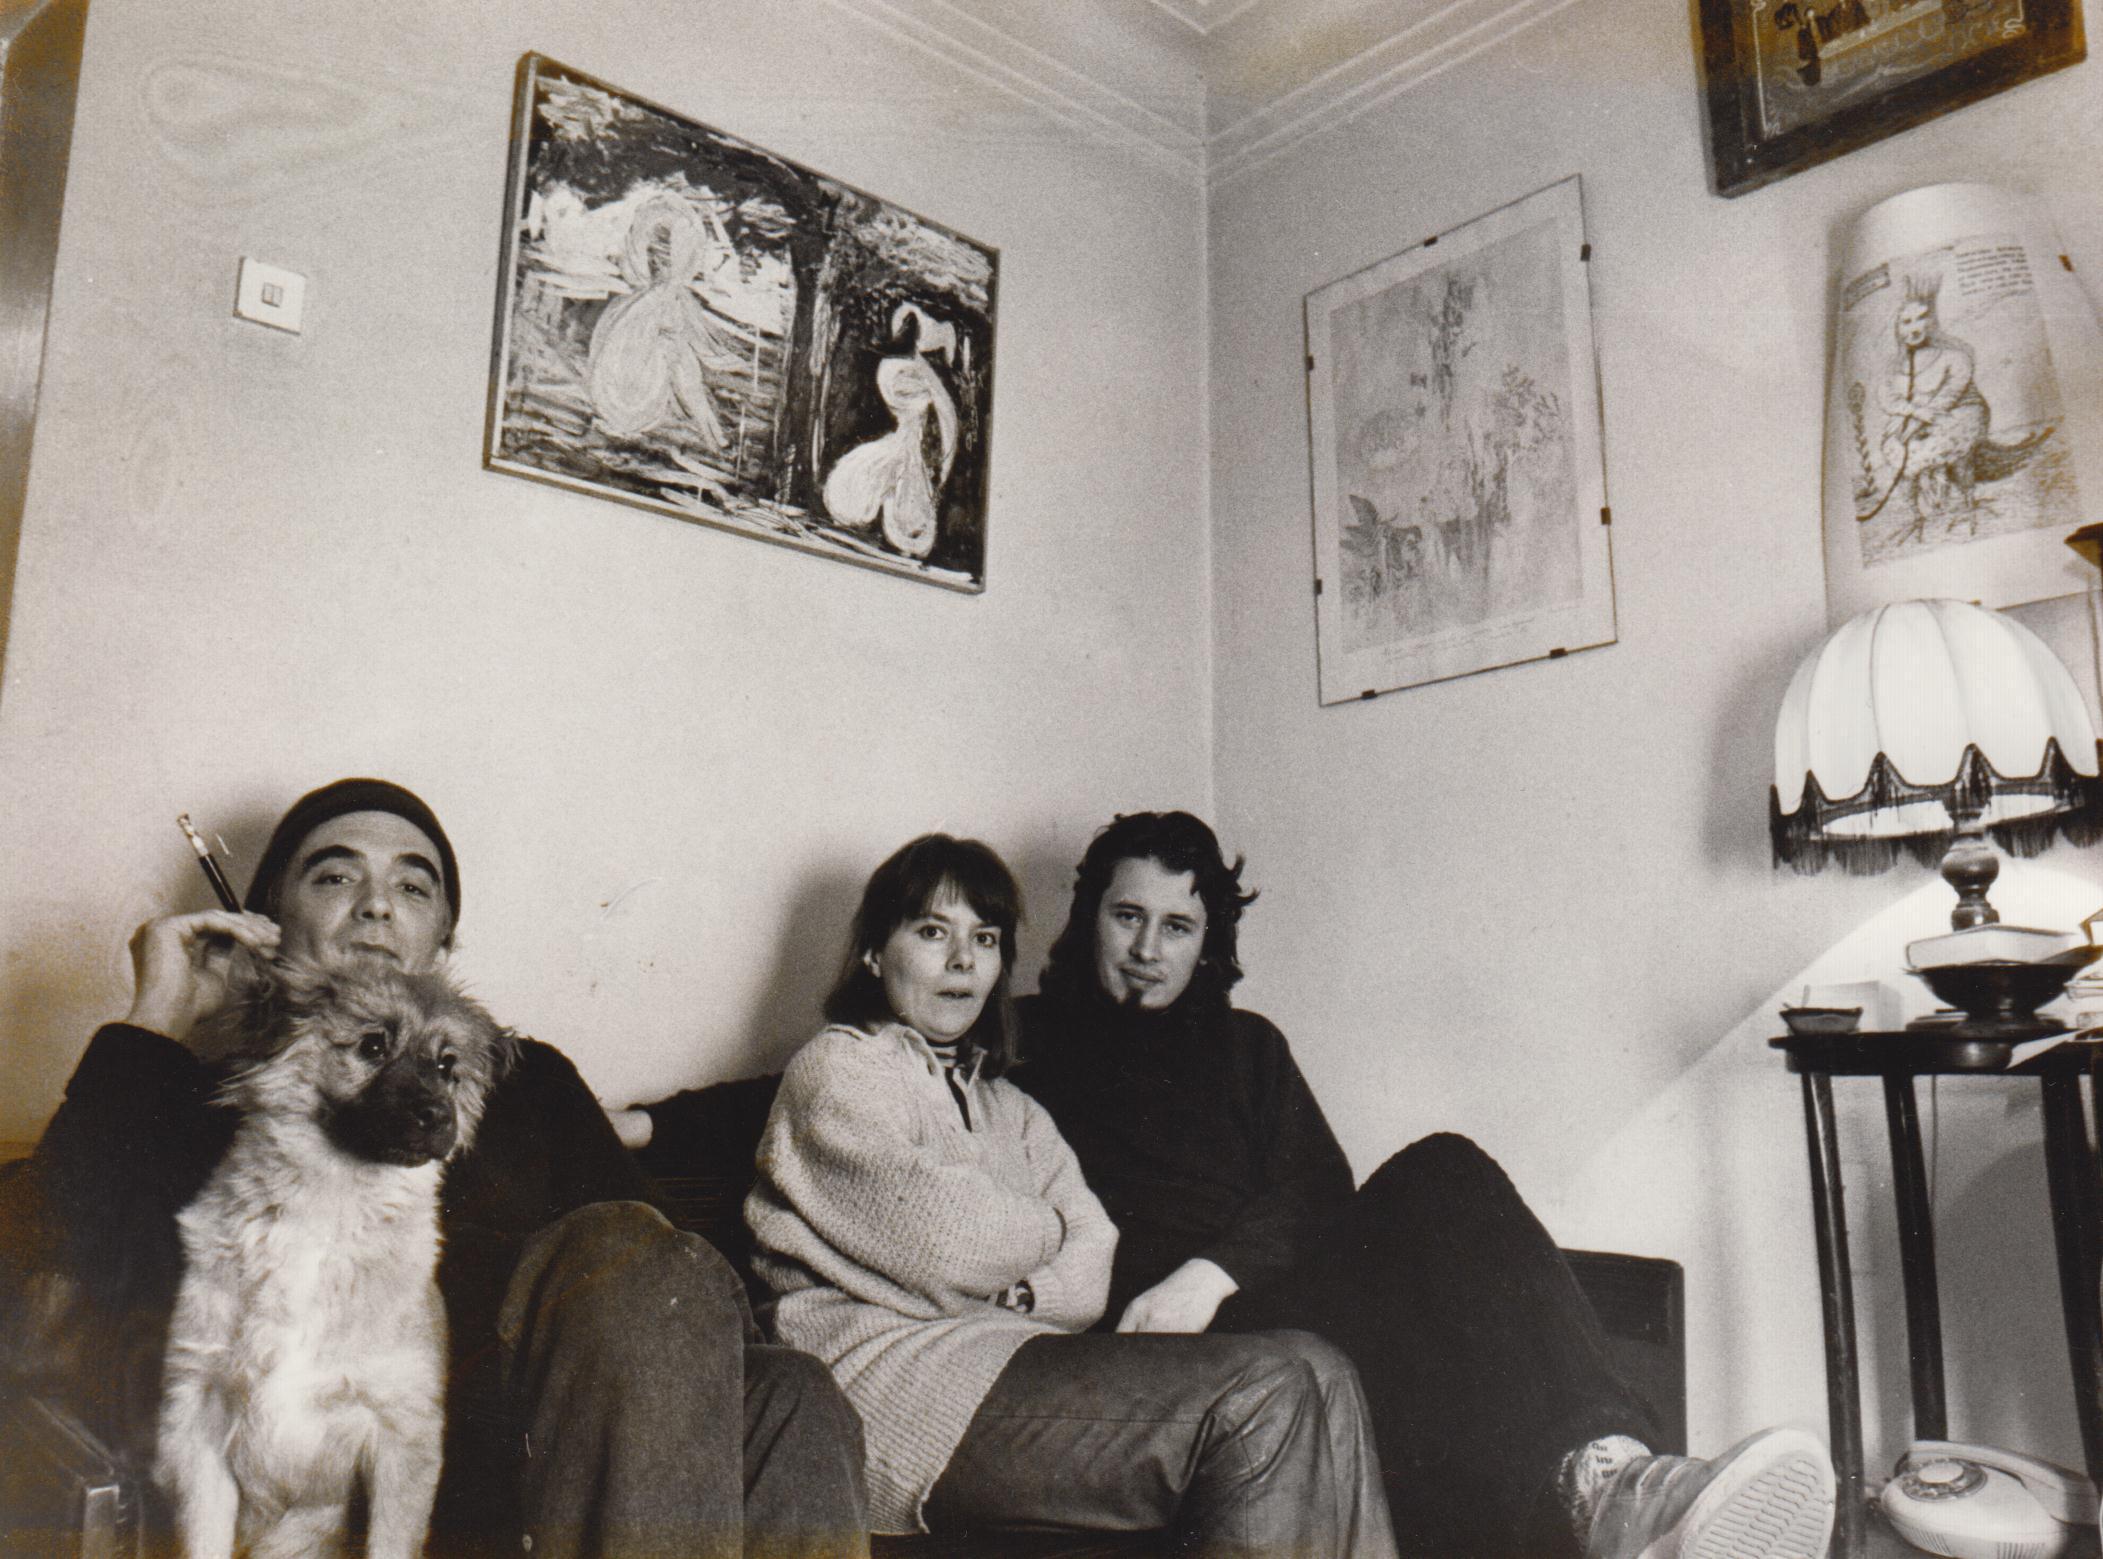 Андрей Монастырский, Татьяна Щербина, Владимир Сорокин, собака Зверик, 1987